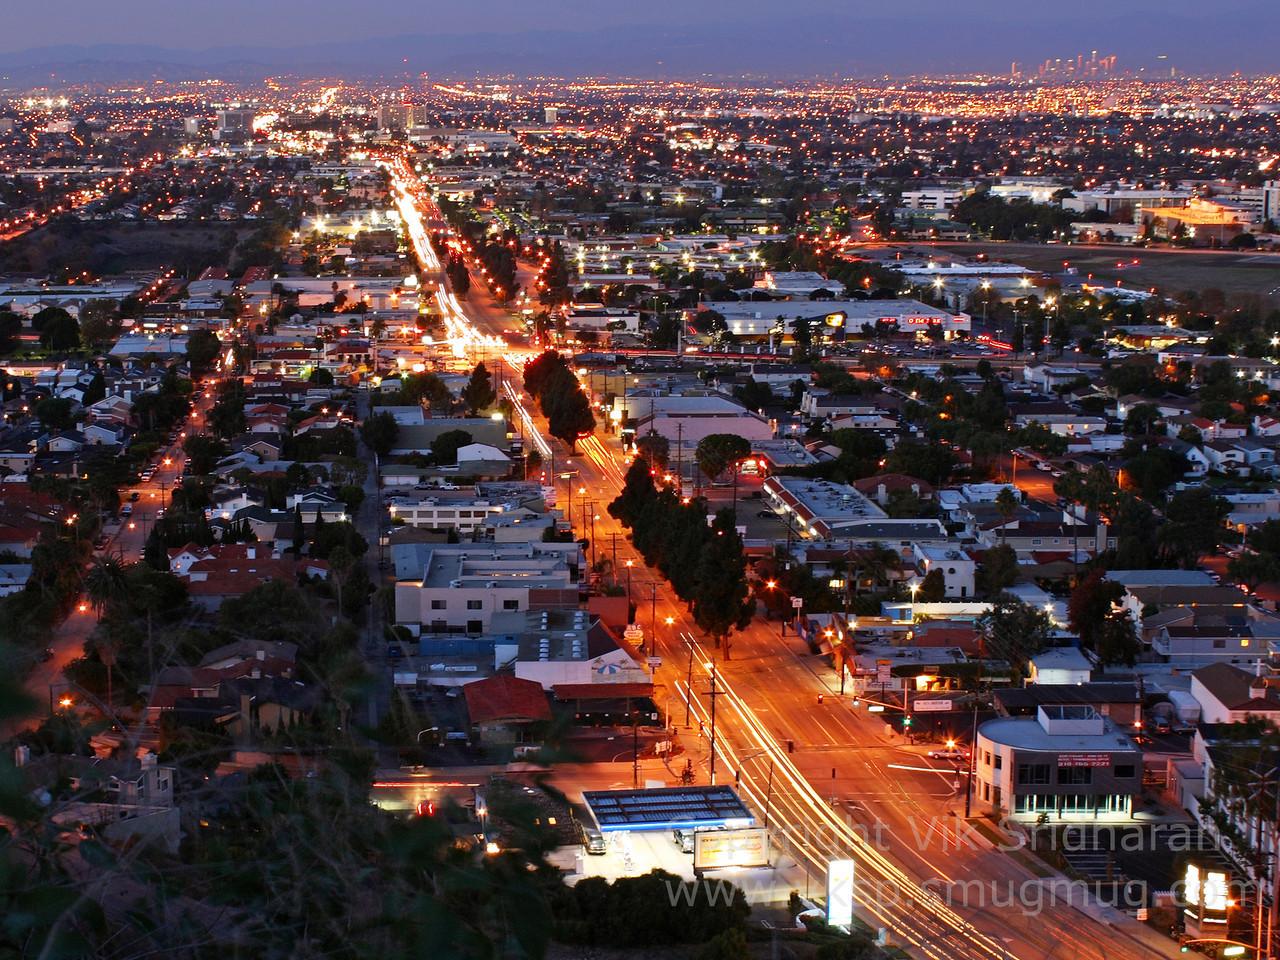 http://www.vksphoto.com/CitiesBuildingsetc/Los-Angeles-at-Dusk/i-LtRgWBn/2/X2/IMG_9325%20bright-X2.jpg